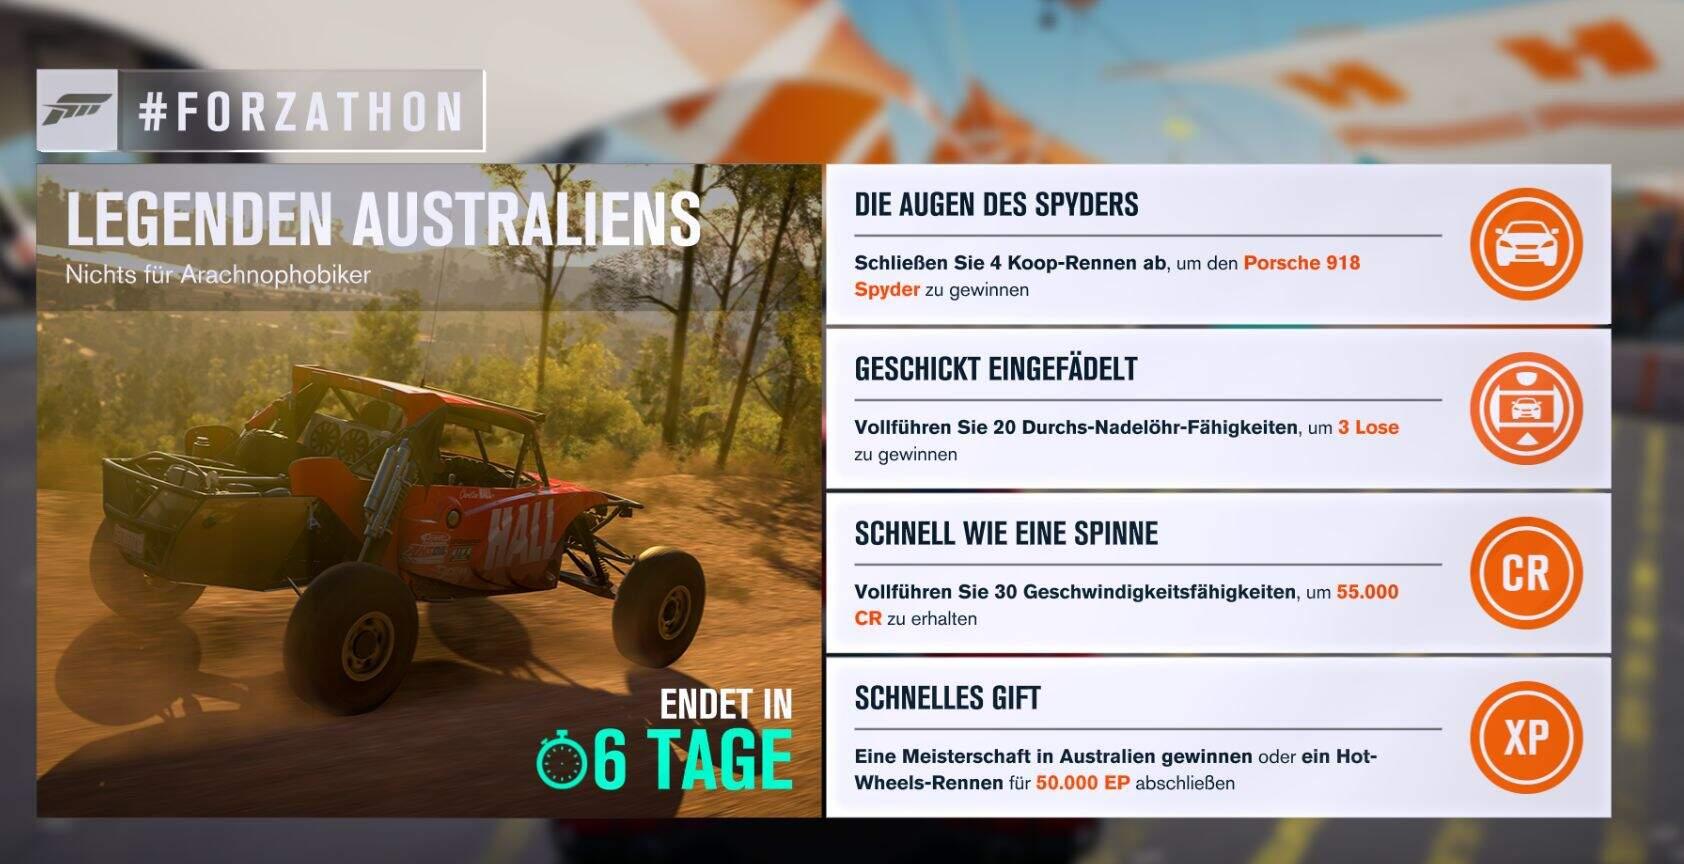 Forza Horizon 3 #Forzathon Guide KW 45 – Legenden Australiens